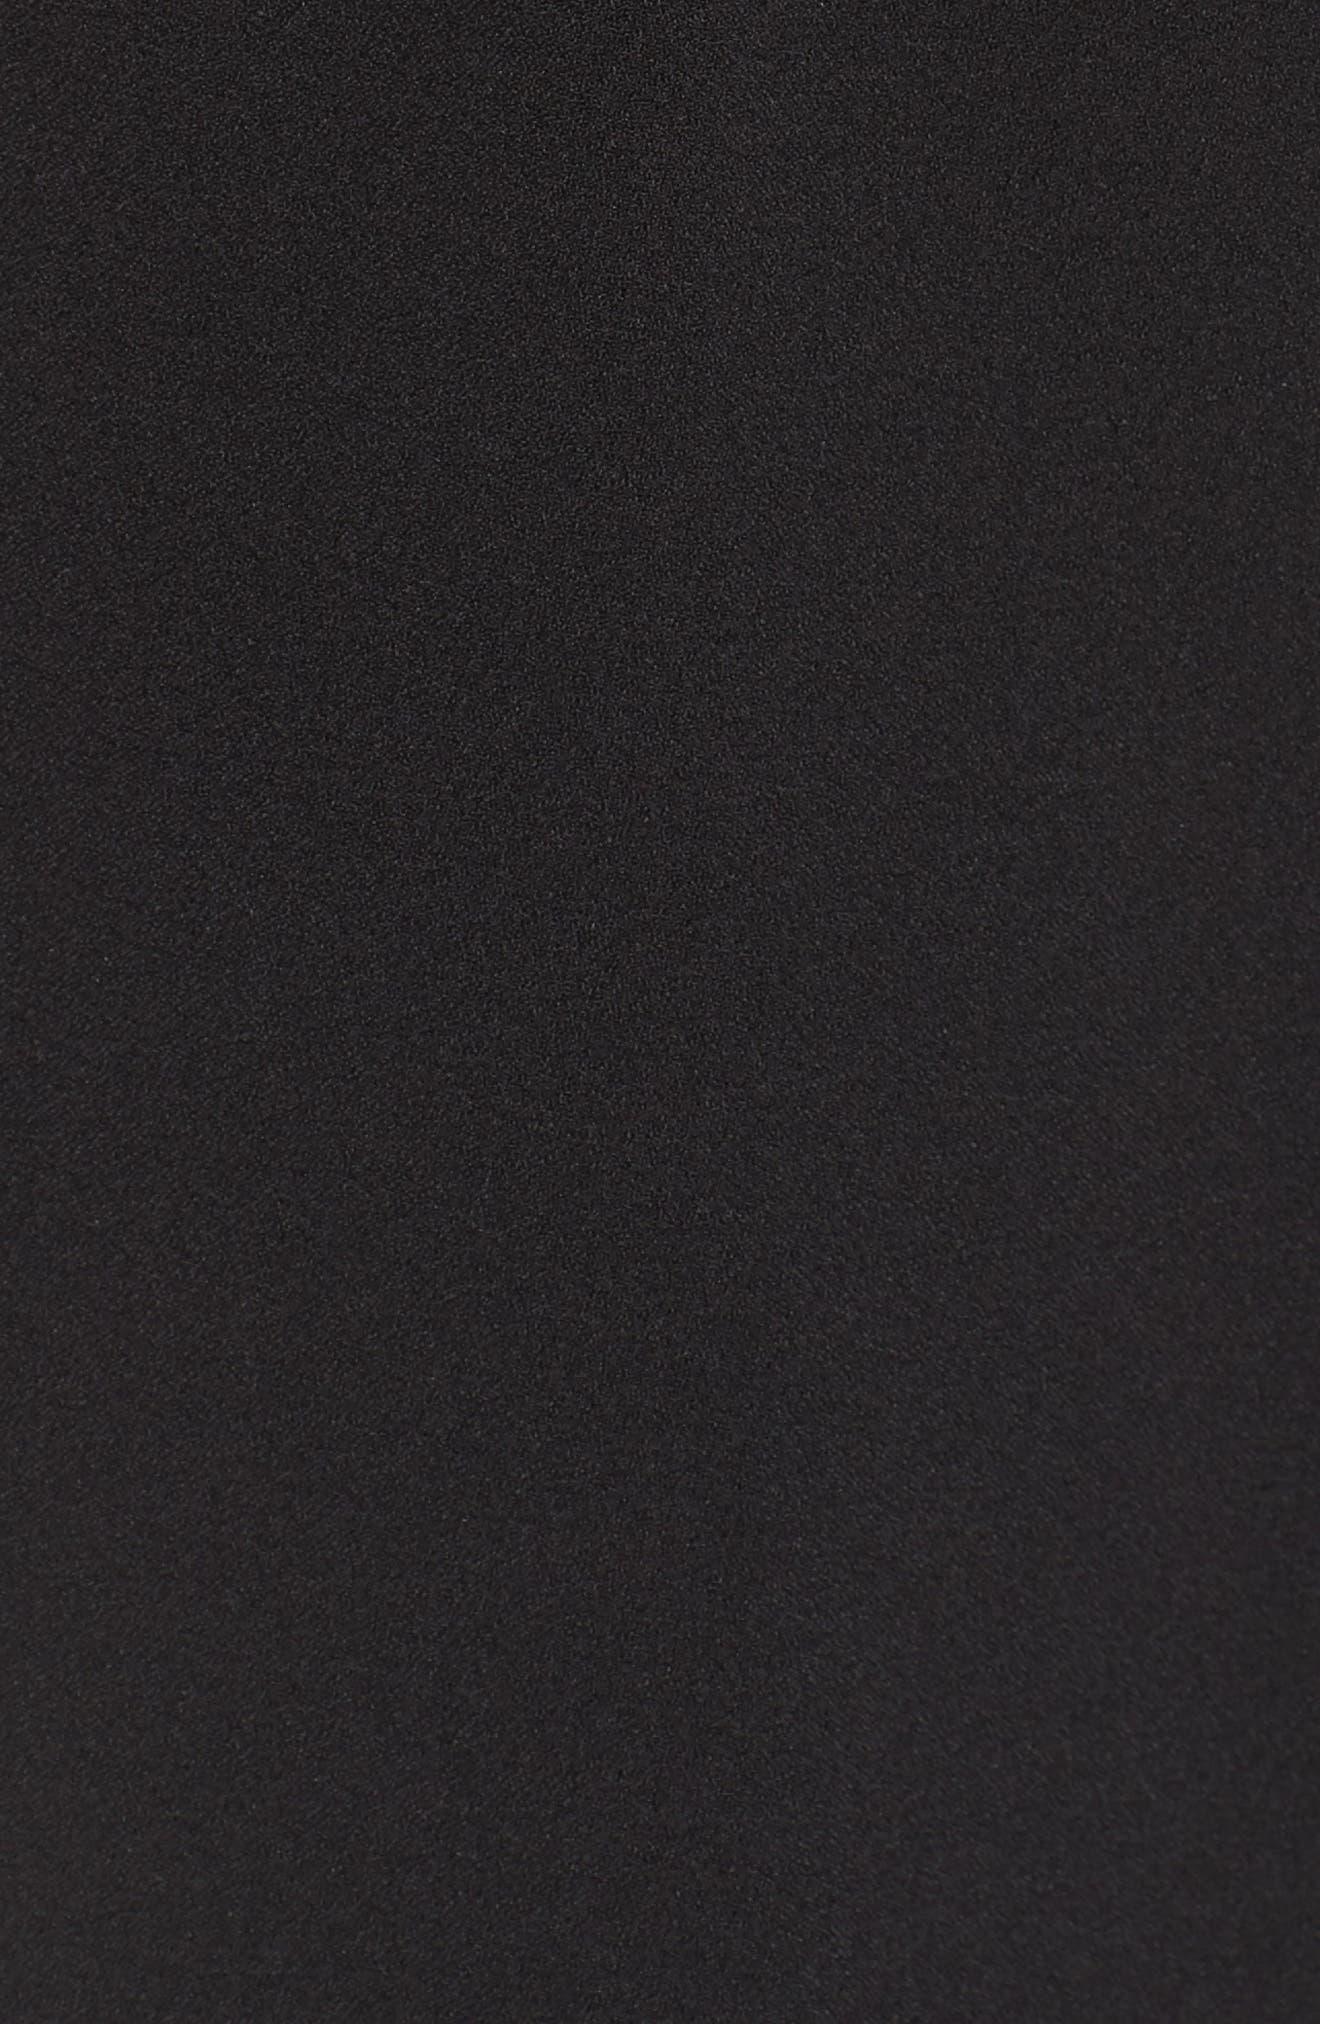 Off the Shoulder Wide Leg Jumpsuit,                             Alternate thumbnail 6, color,                             BLACK/ IVORY